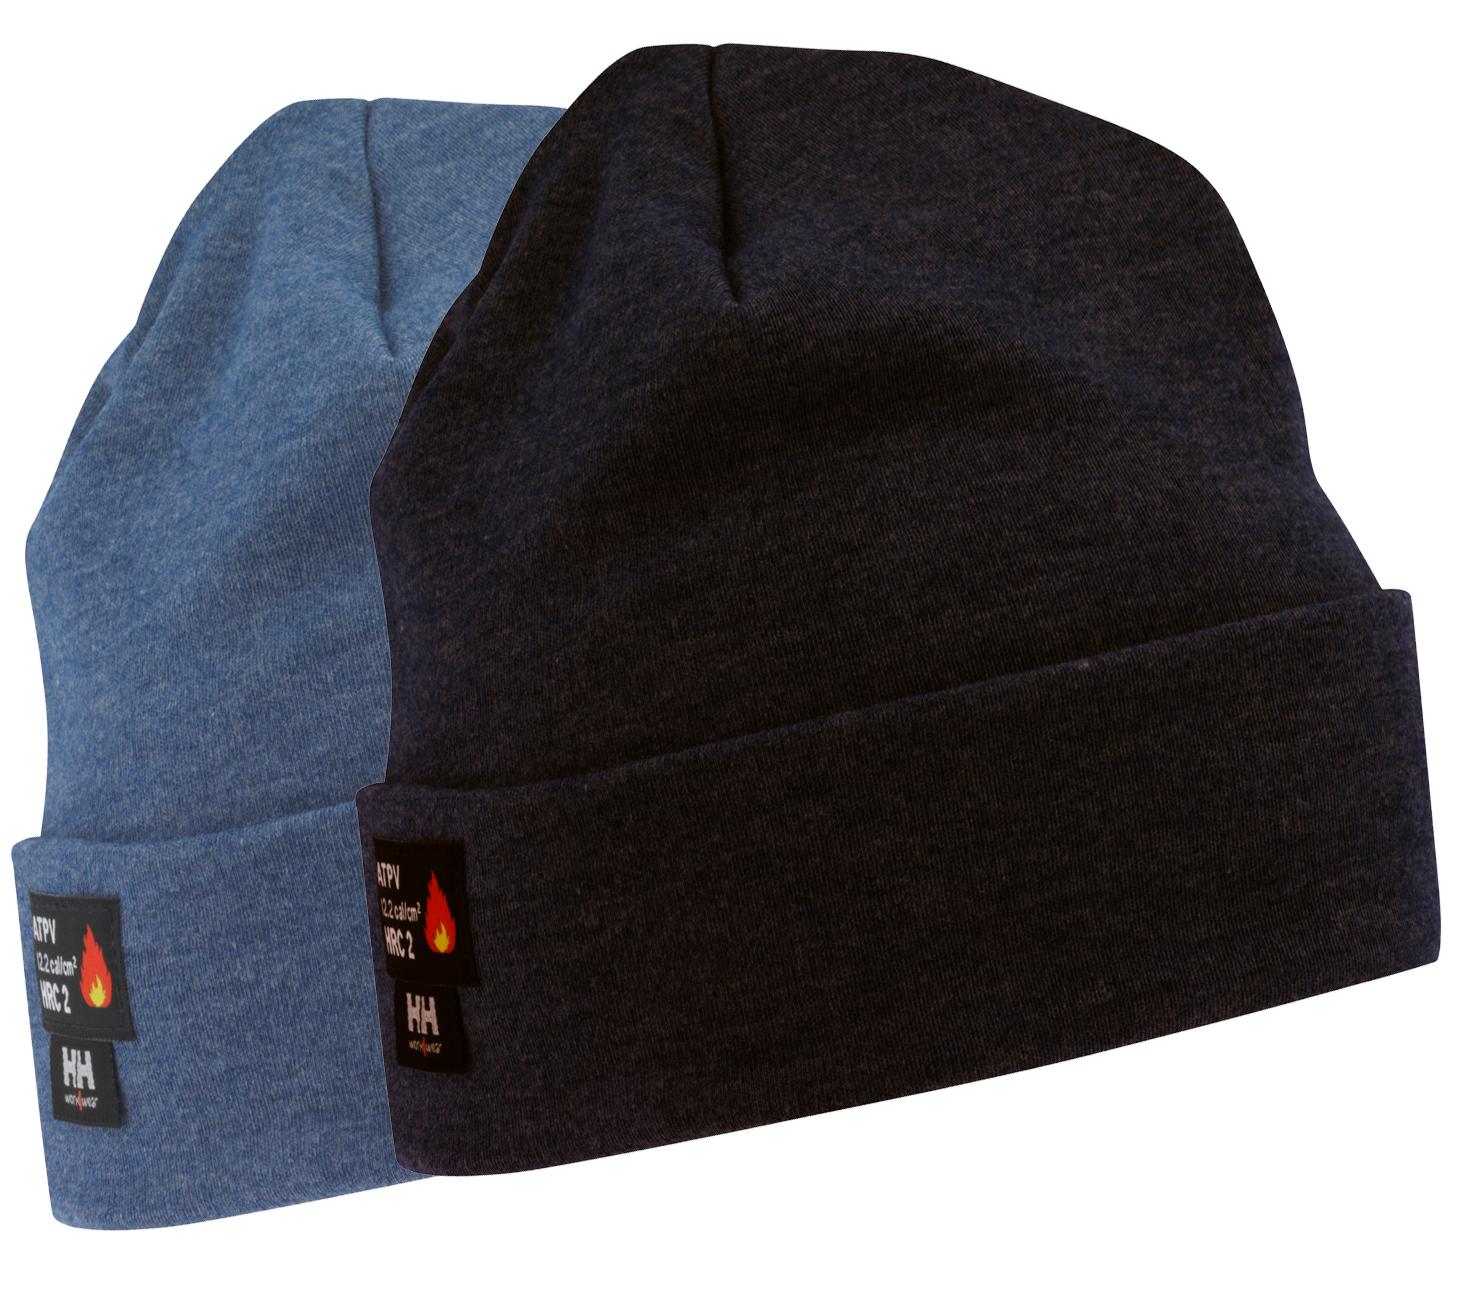 e5d47eb57cf Helly Hansen Fargo Fire Resistant Beanie — iWantWorkwear